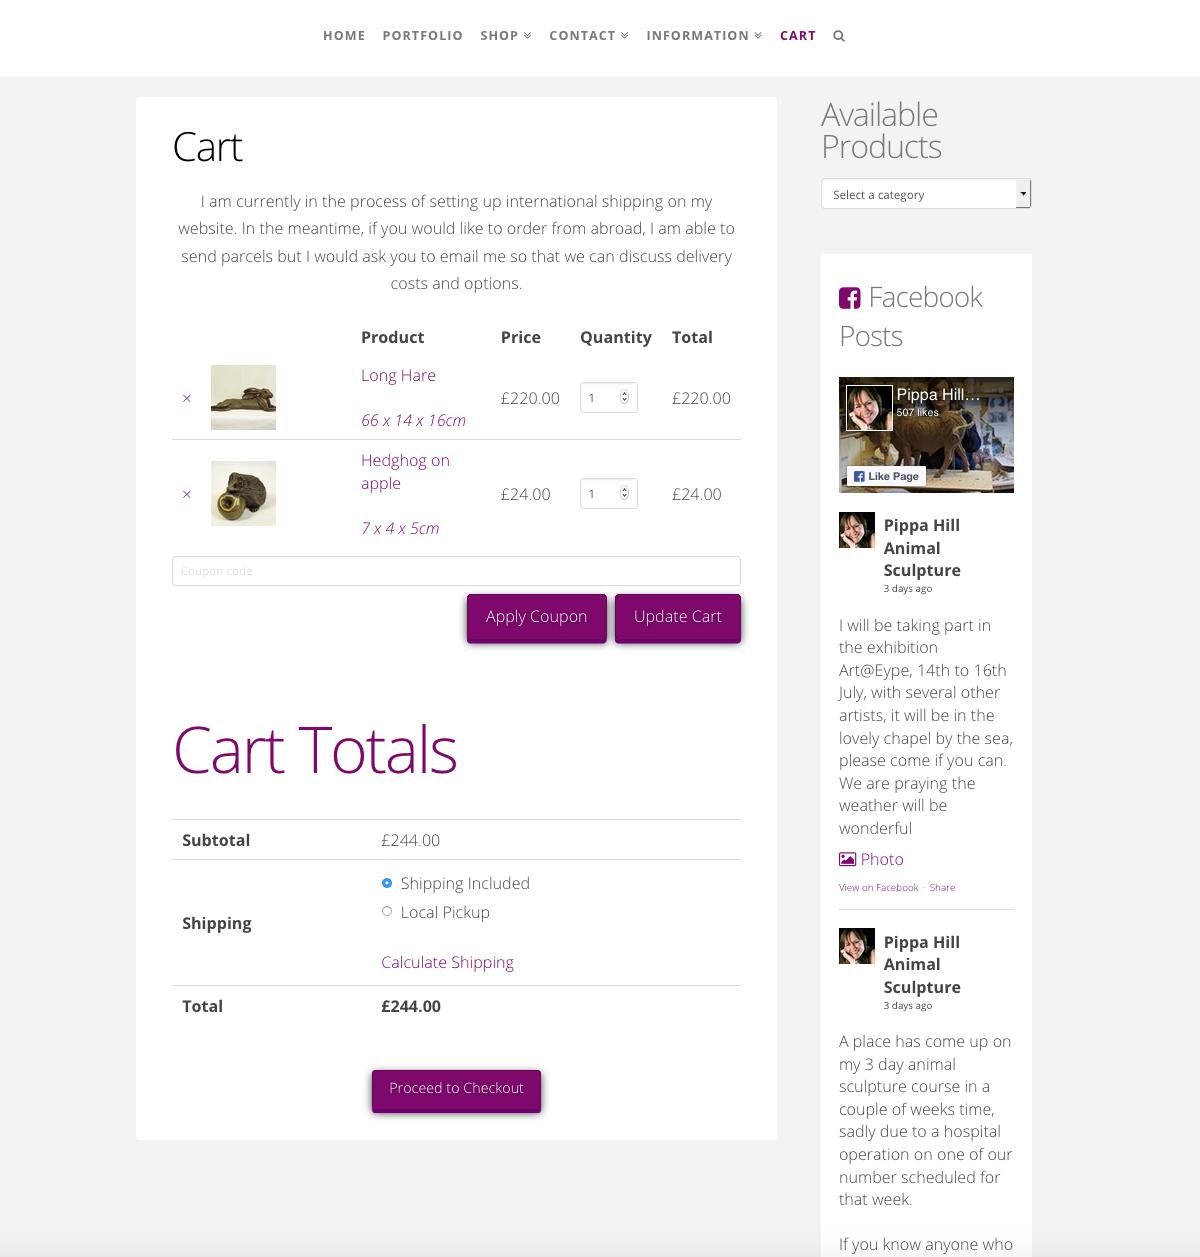 Pippa Hill Sculpture Portfolio eCommerce Web Design Sherborne Dorset Cart Basket